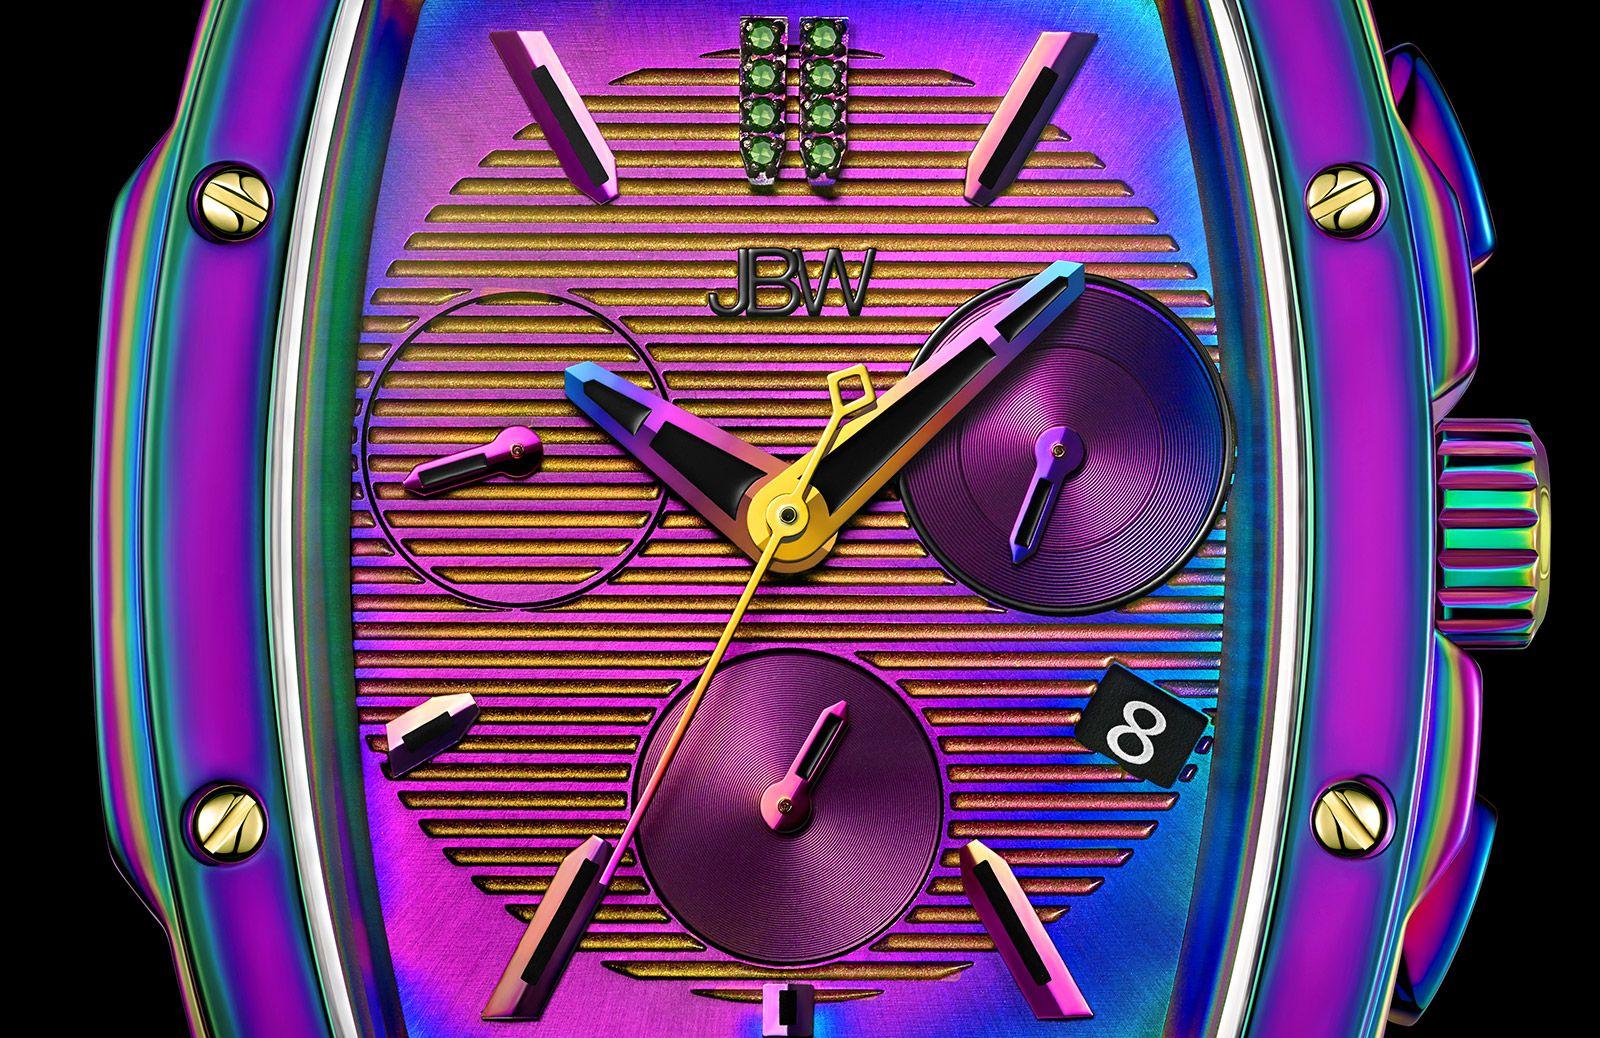 jbw-reserve-iridescent-echelon-07